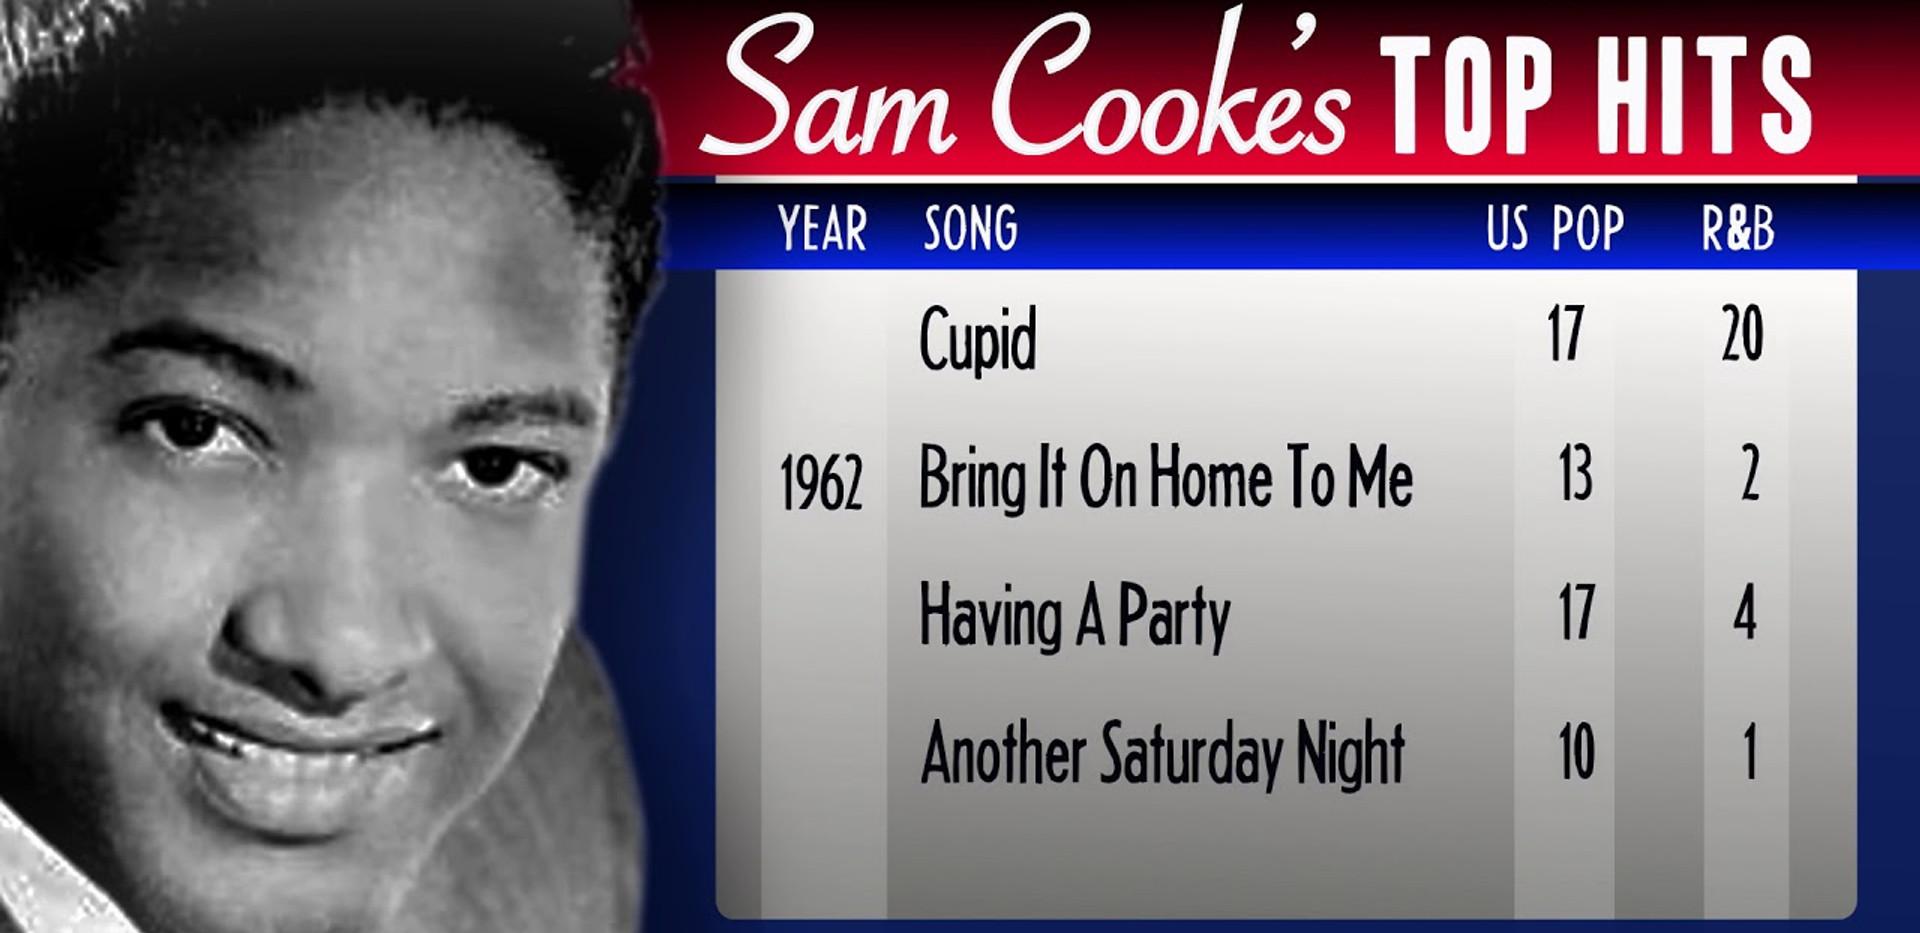 Illinois Music Stories - Sam Cooke